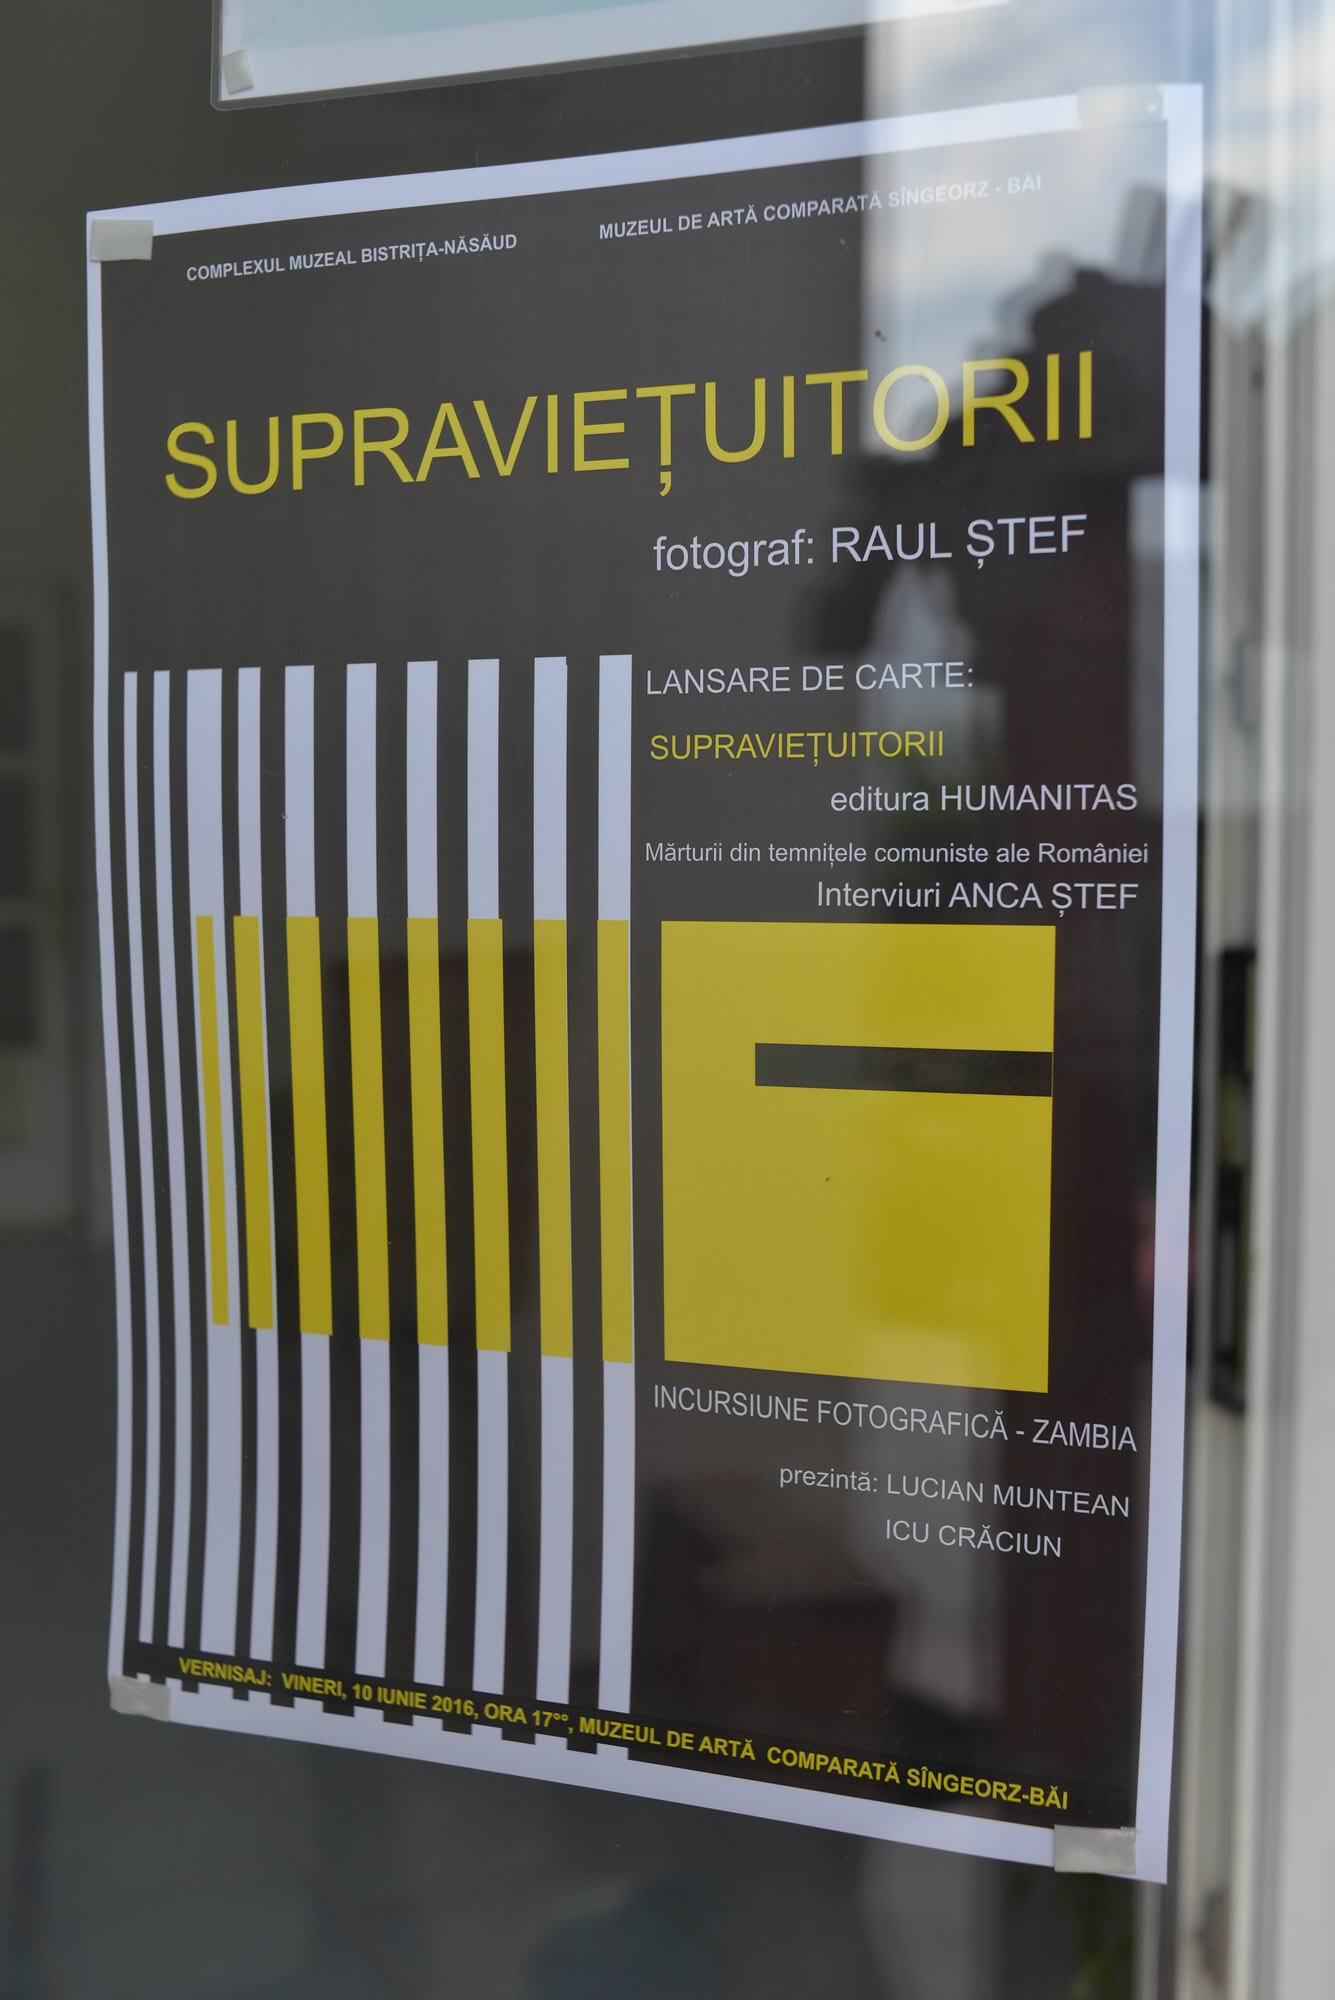 Supravietuitorii - Anca - Raul Stef - LM_0002